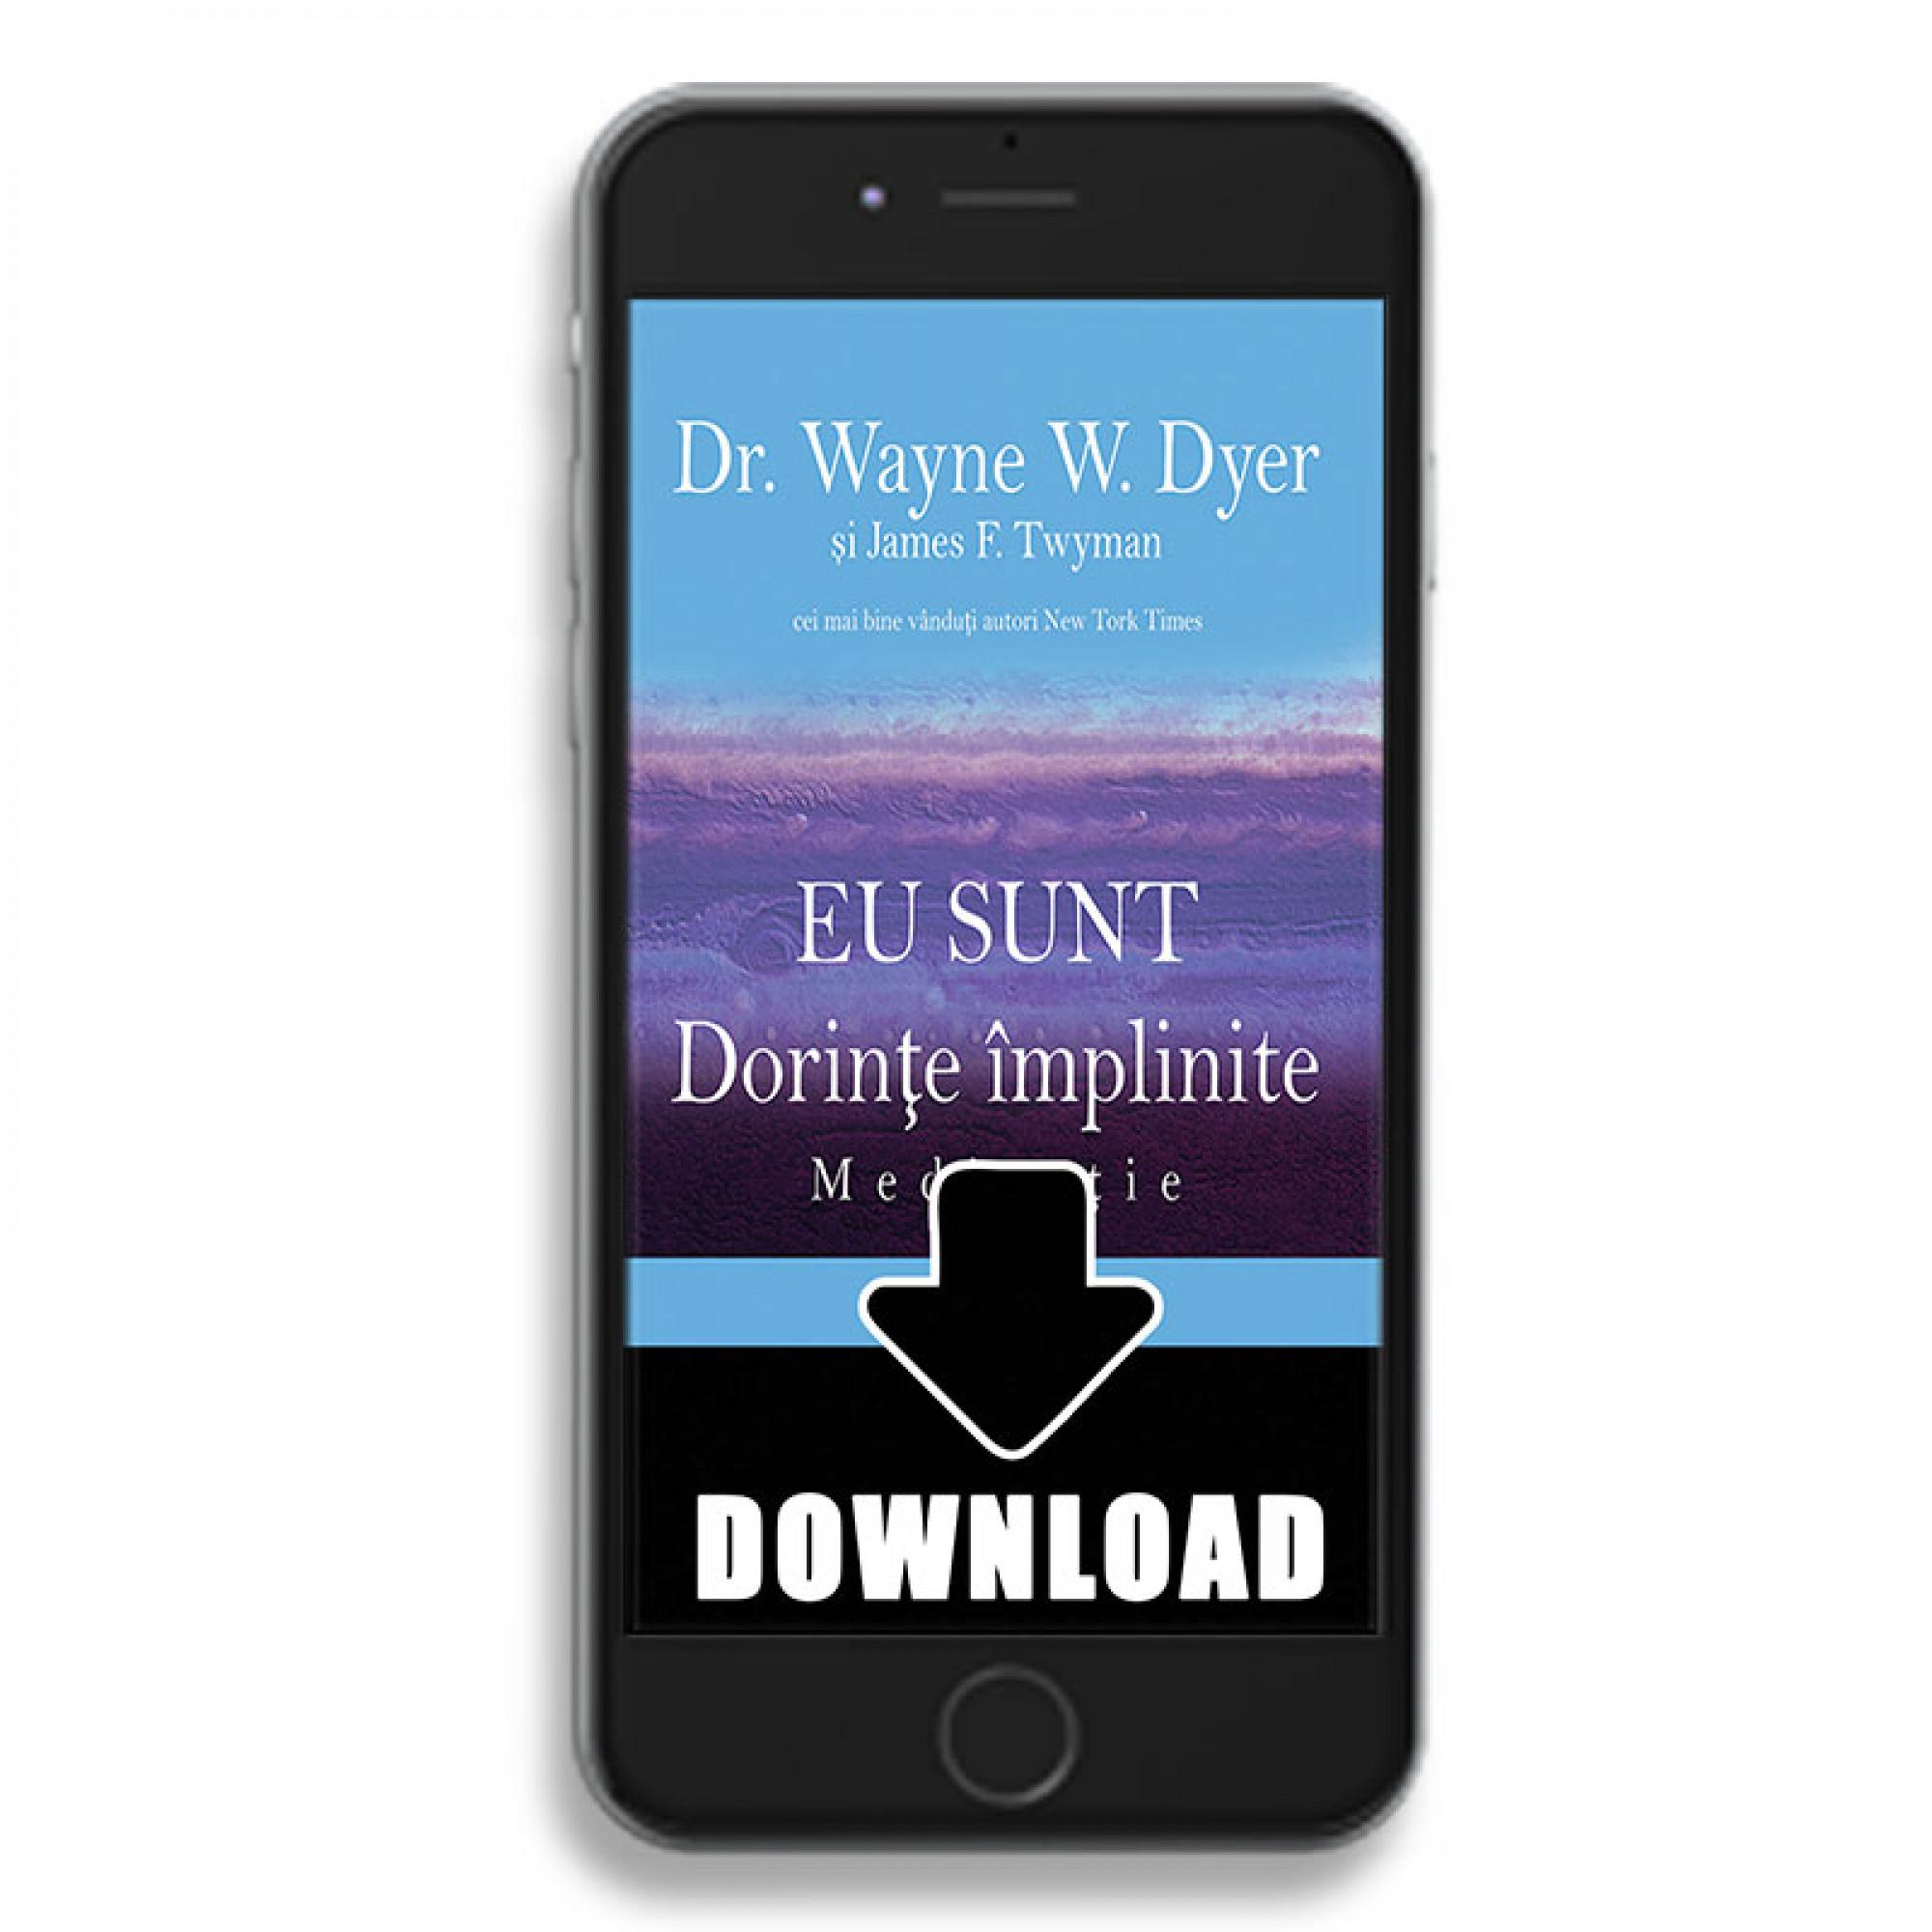 EU SUNT Dorințe împlinite - Meditație - Meditație; carte audio; Dr. Wayne W. Dyer si James F. Twyman